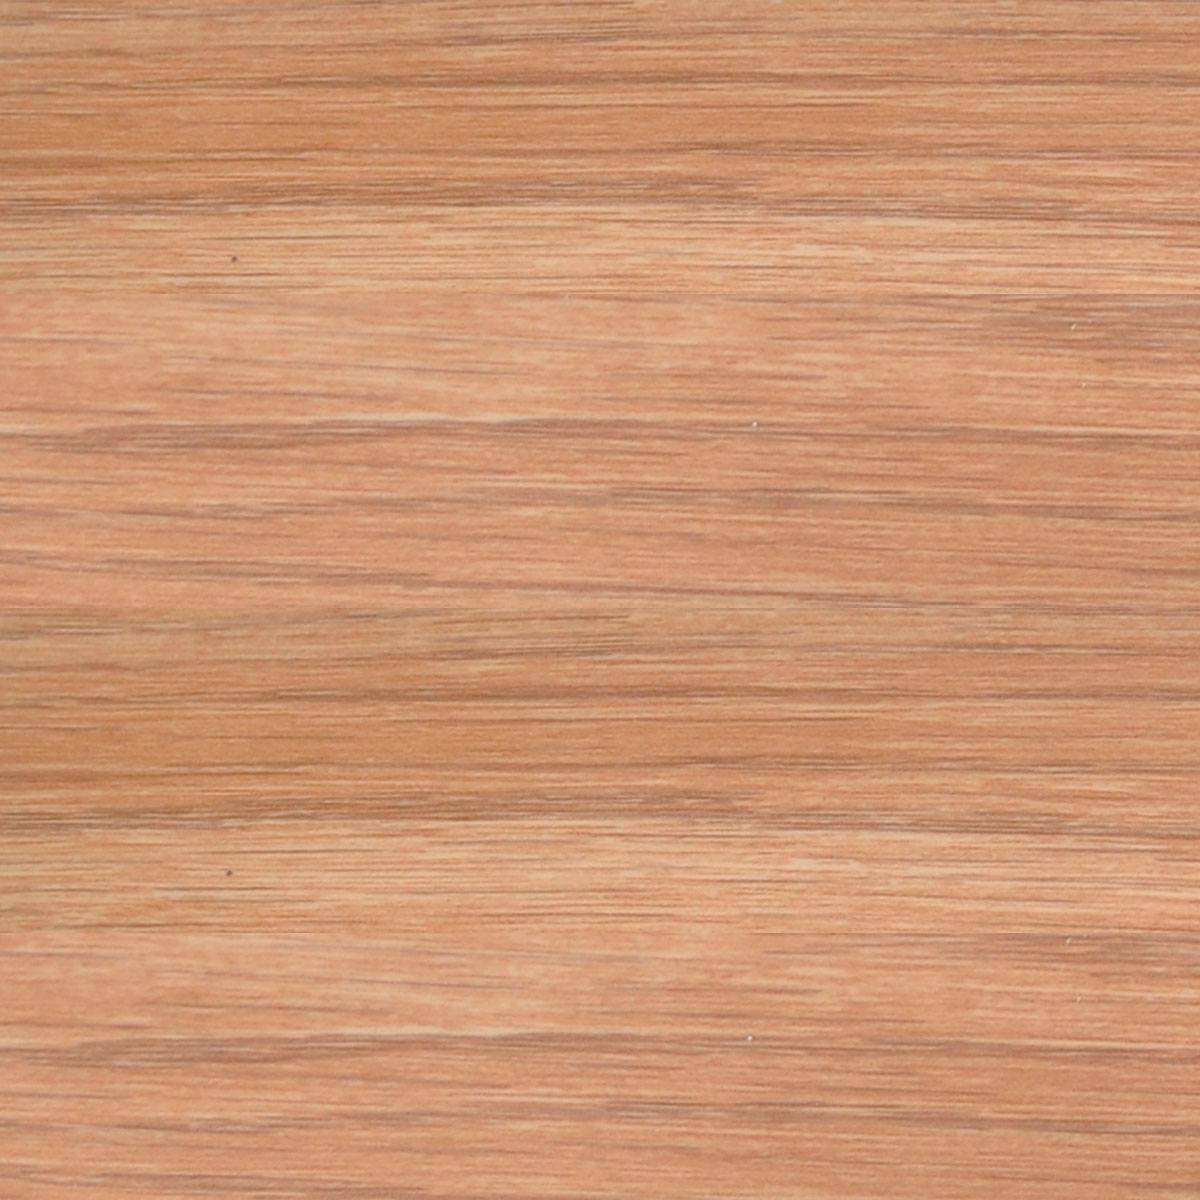 Pine Sample